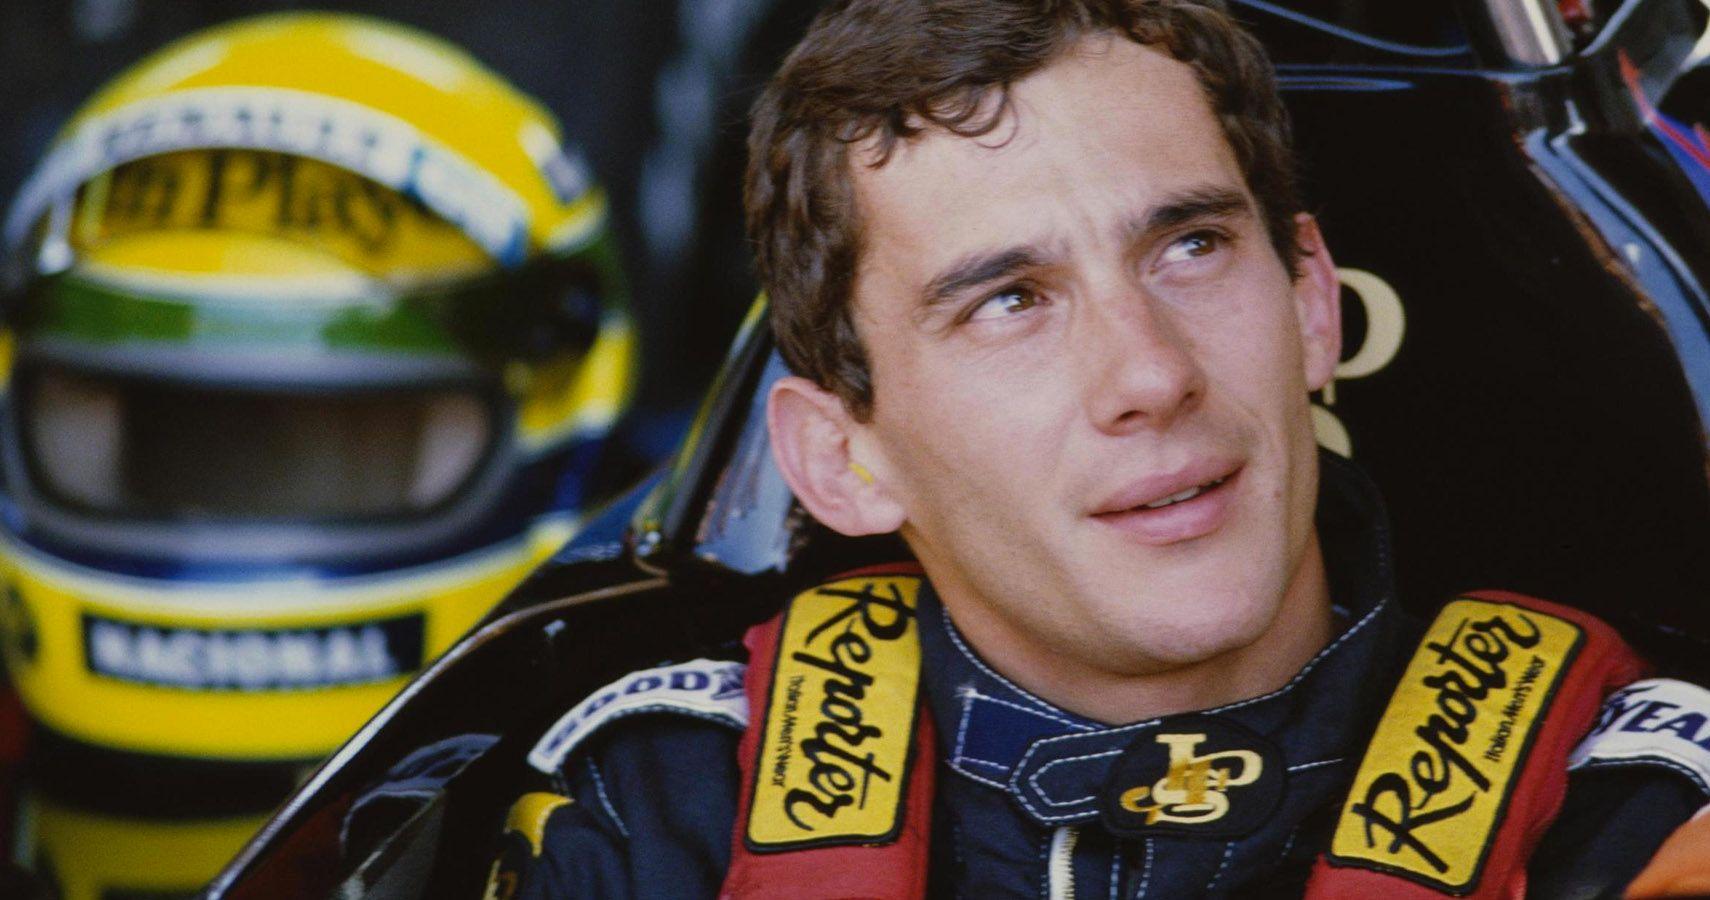 Ayrton Senna: 10 Things All Formula 1 Fans Should Know